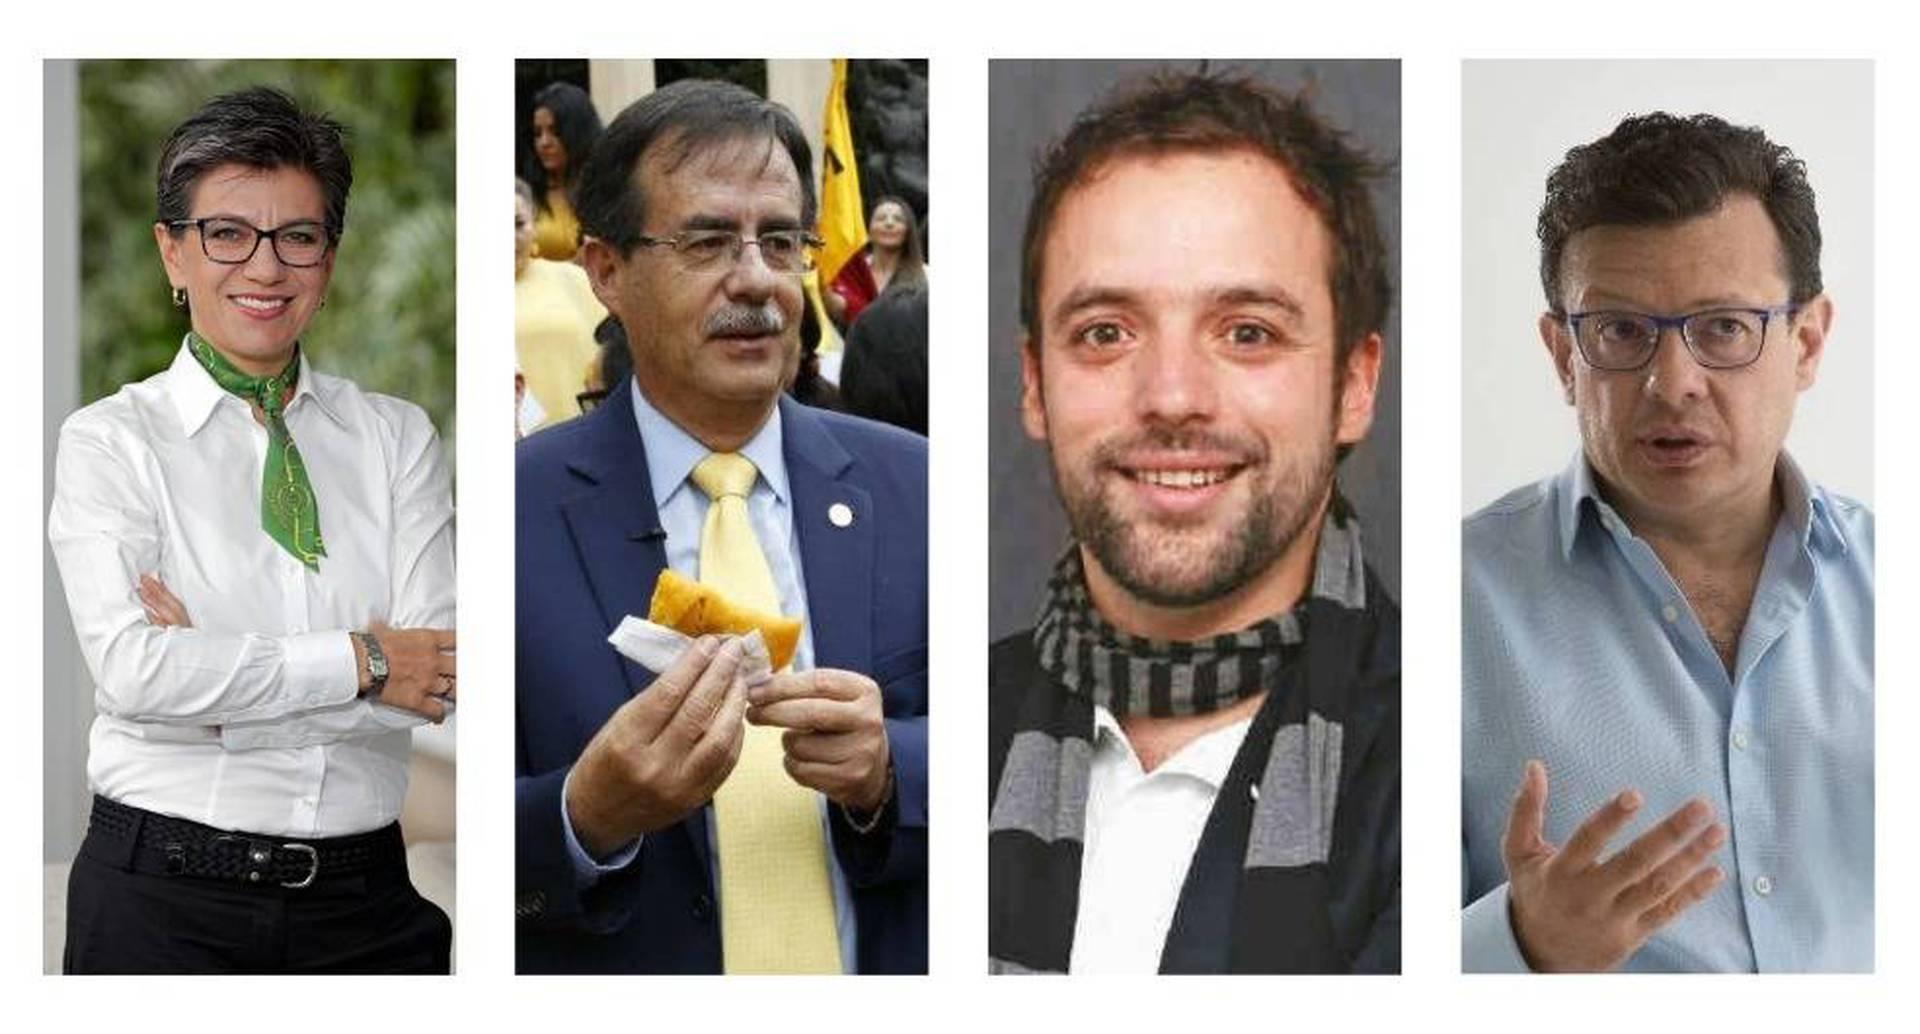 Claudia López (Alianza Verde), Celio Nieves (Polo), Luis Ernesto Gómez (Activista), Hollman Morris (Mais)